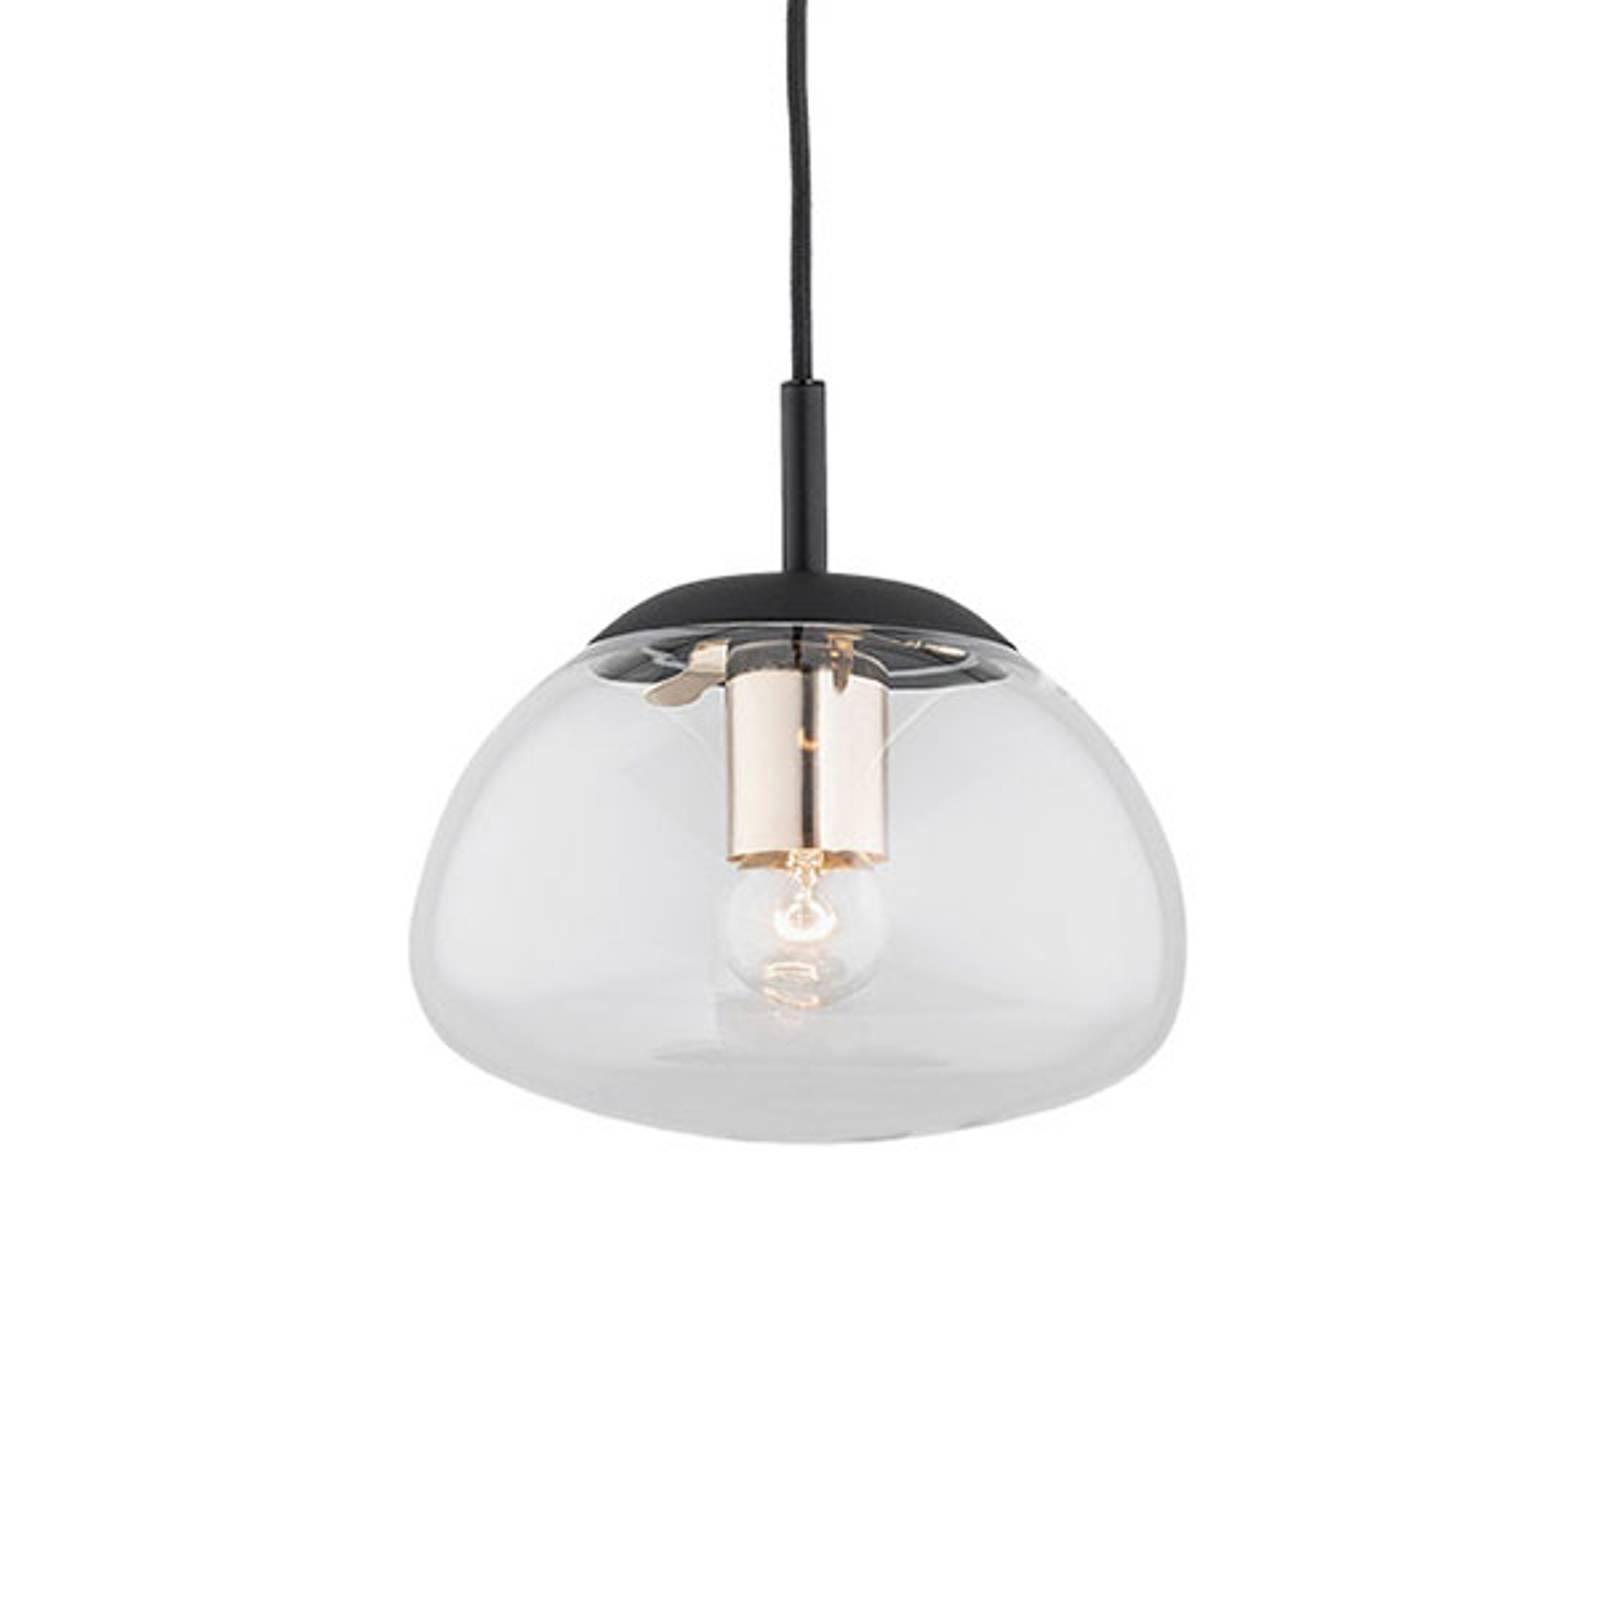 Suspension Turku 1 lampe transparente/noire Ø 20cm